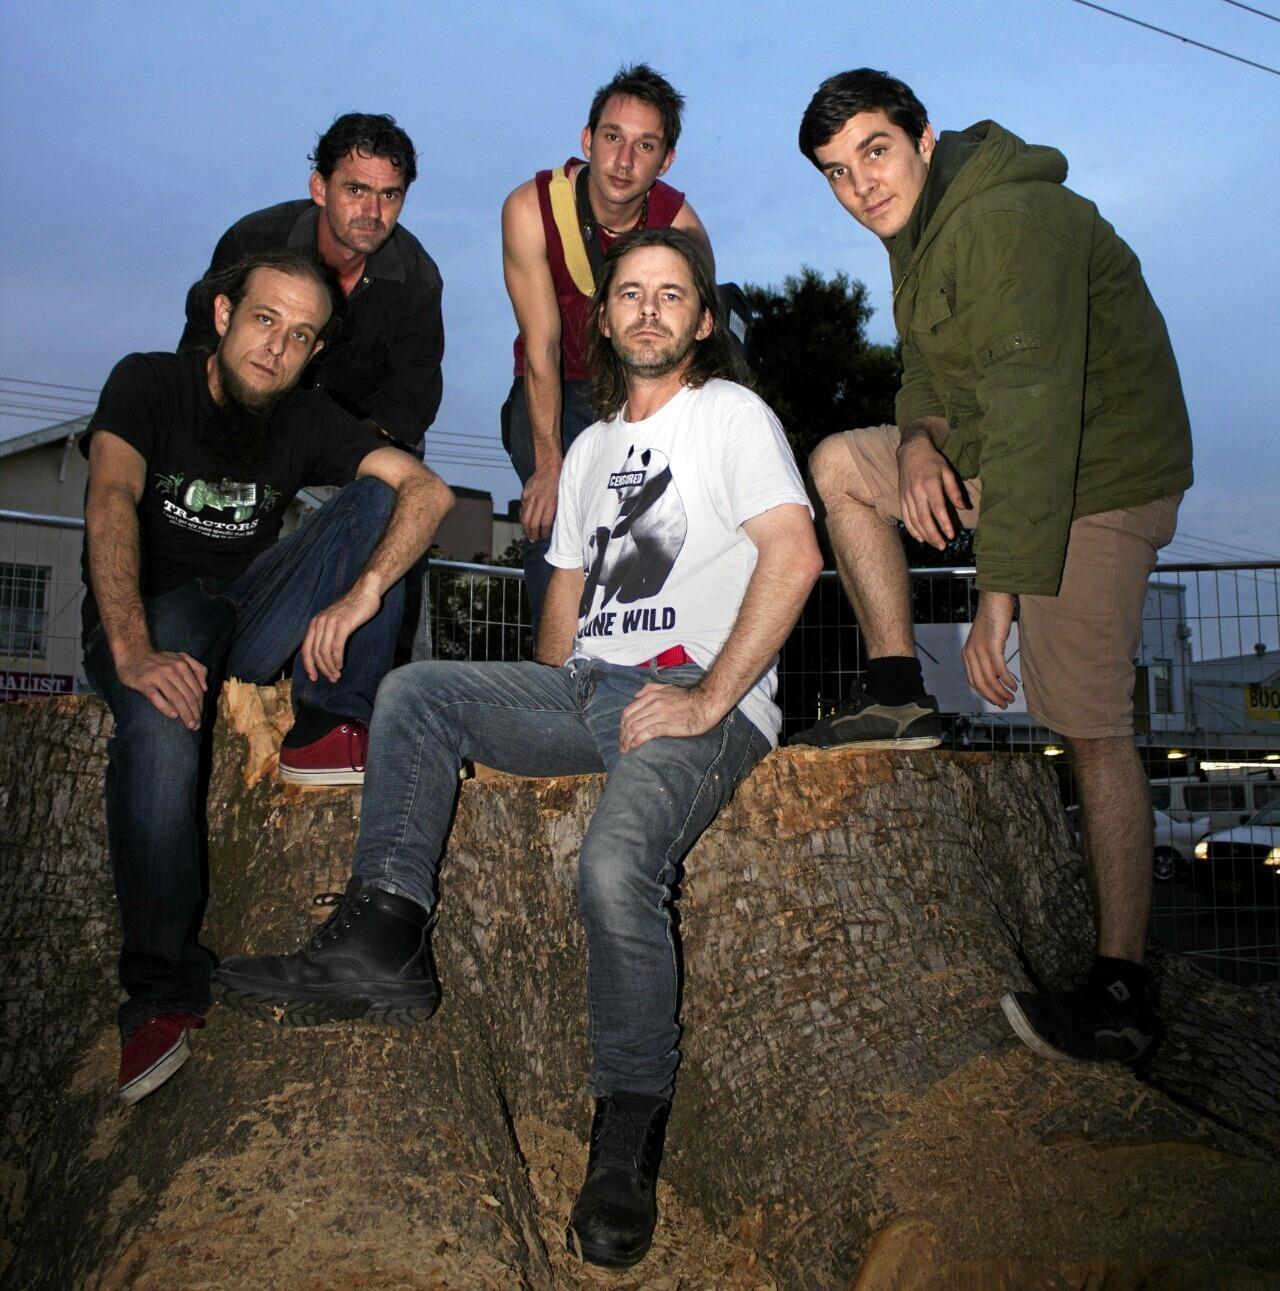 SHOW: Lismore comedy rock band Humans of Lismore.